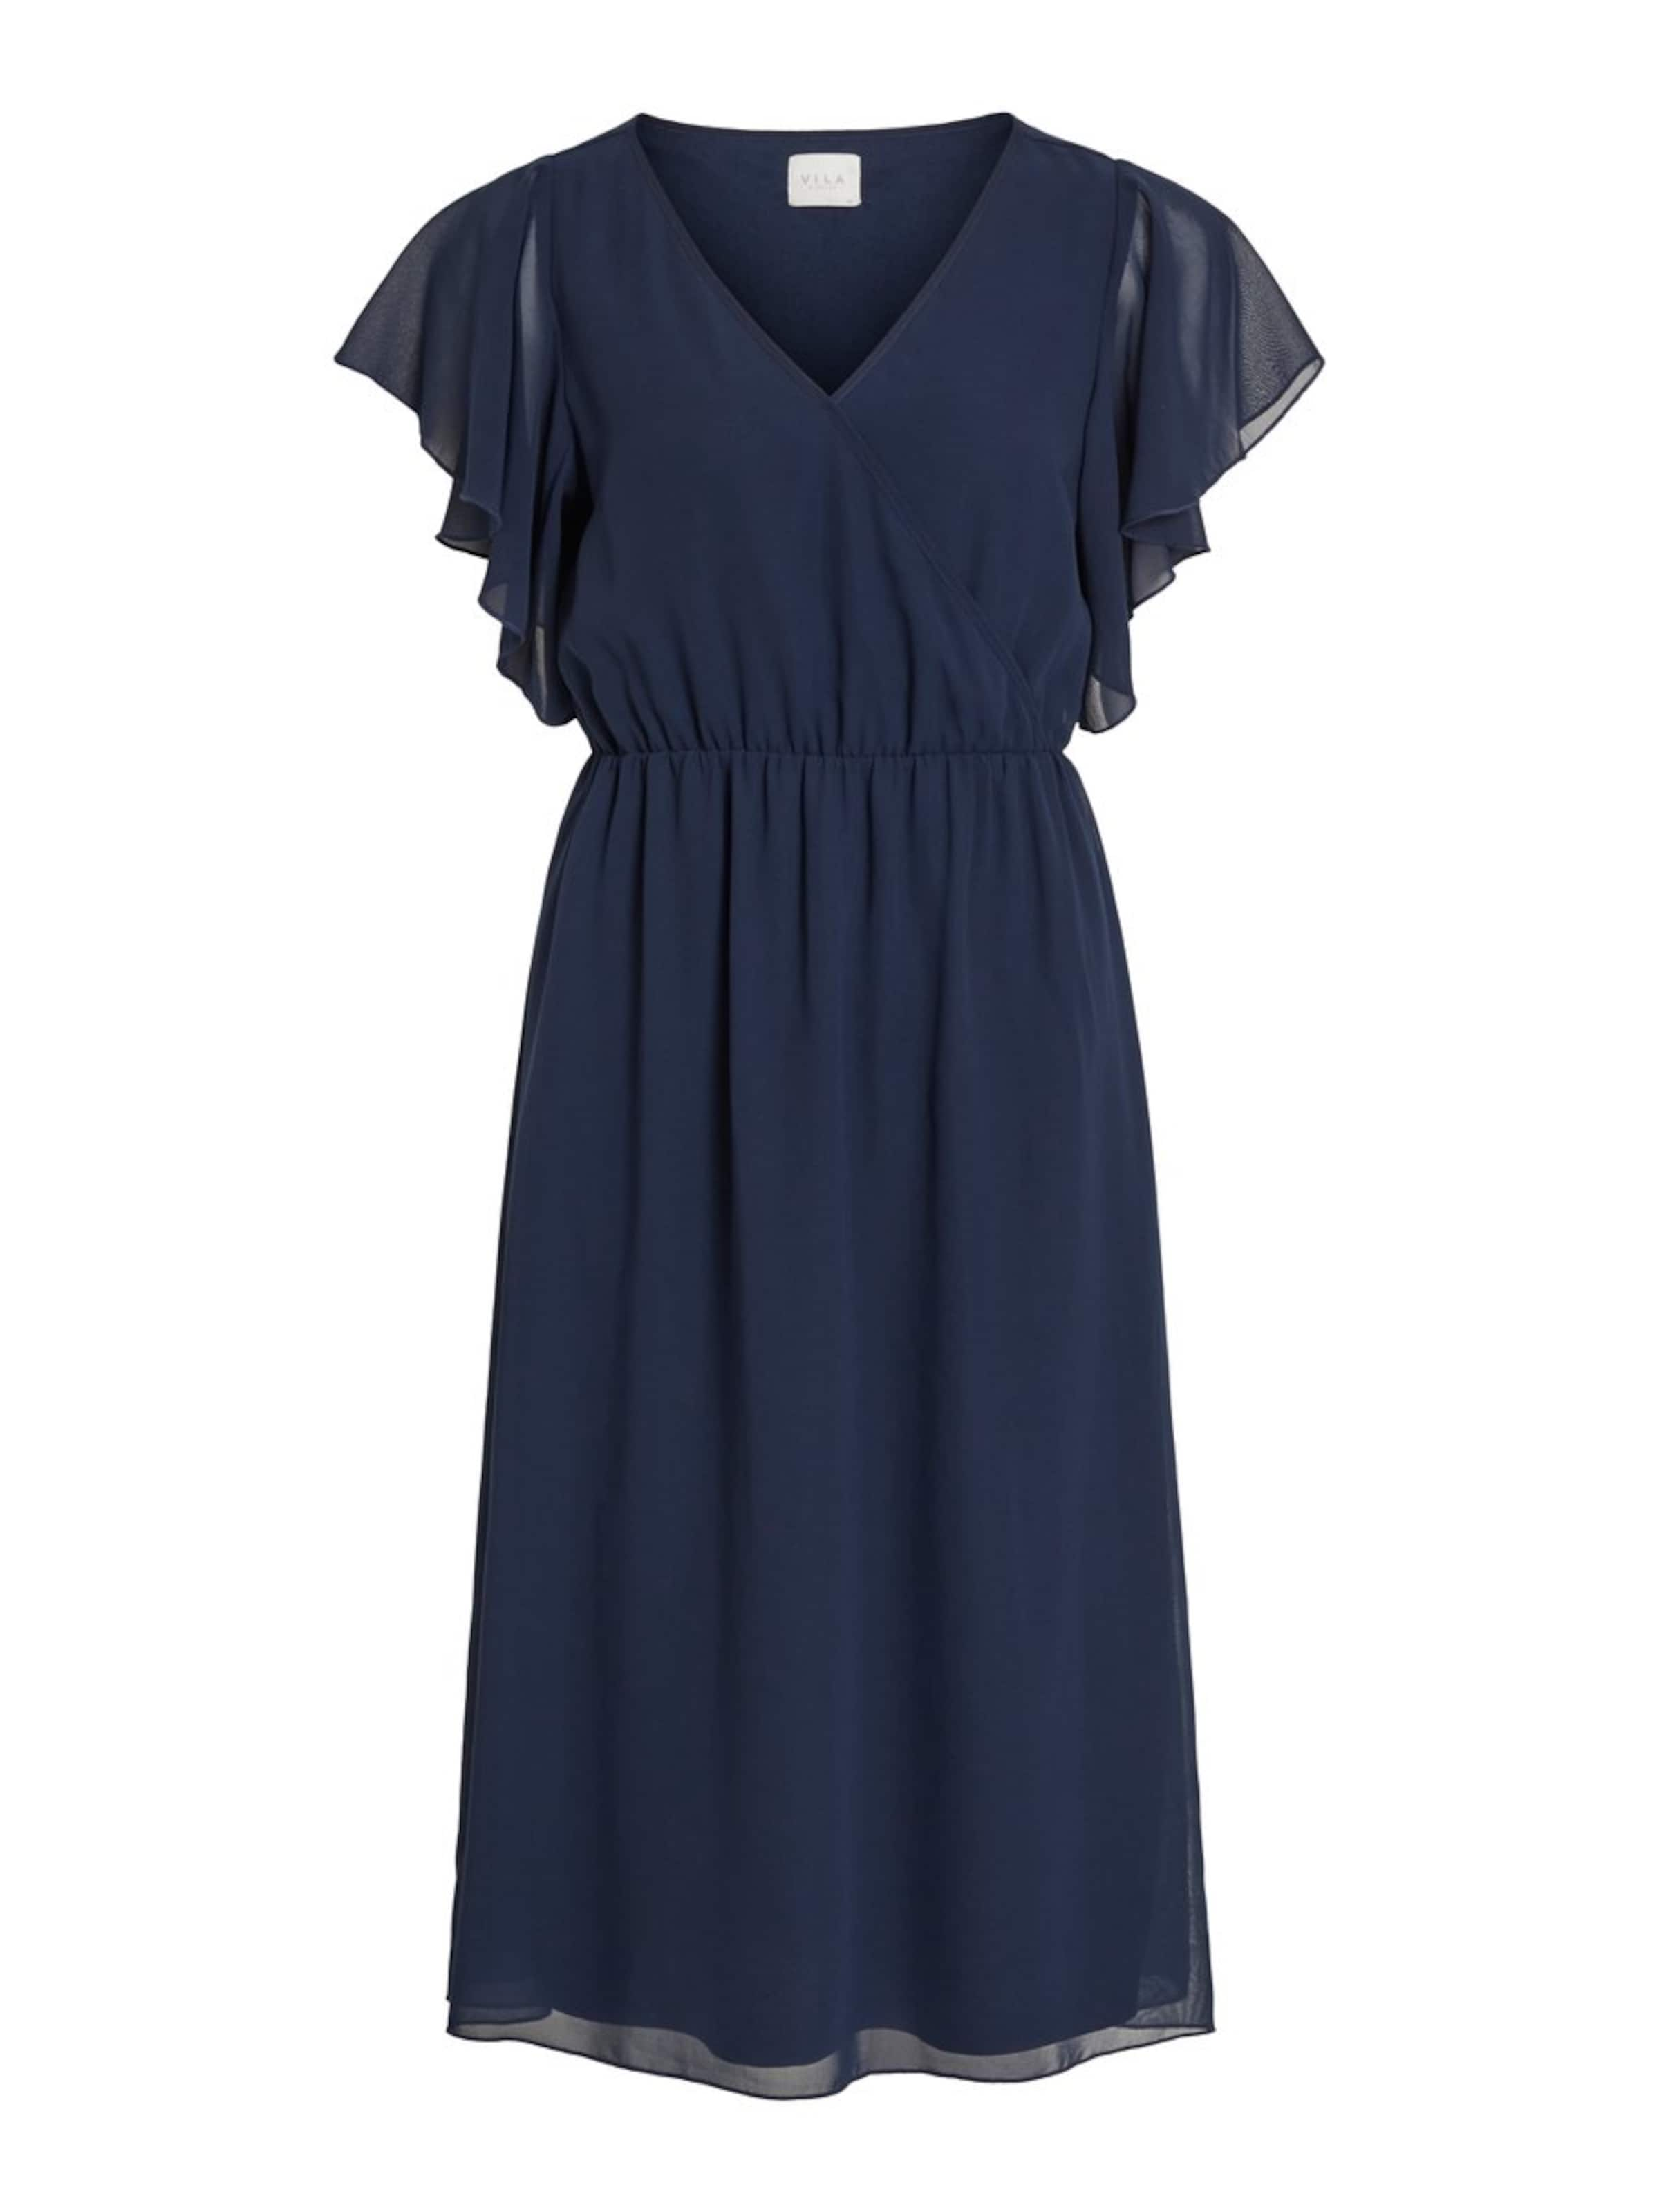 Robe Robe Bleu En Vila Robe Marine Vila Marine Vila Bleu En 8Oyn0Nwvm